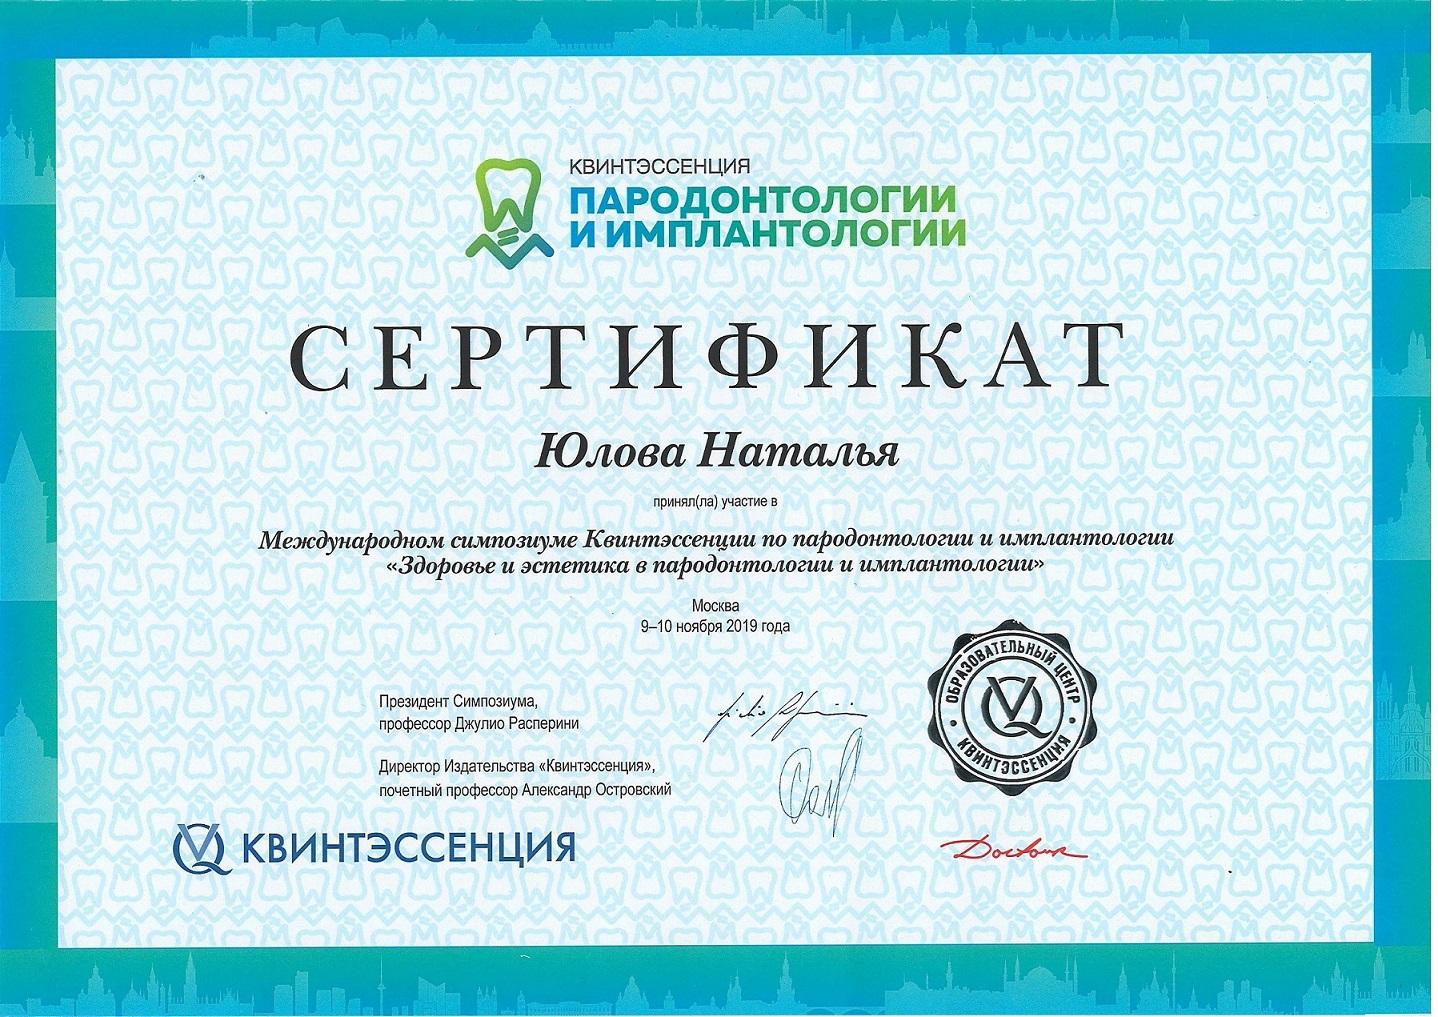 Сертификат Юлова (2019)